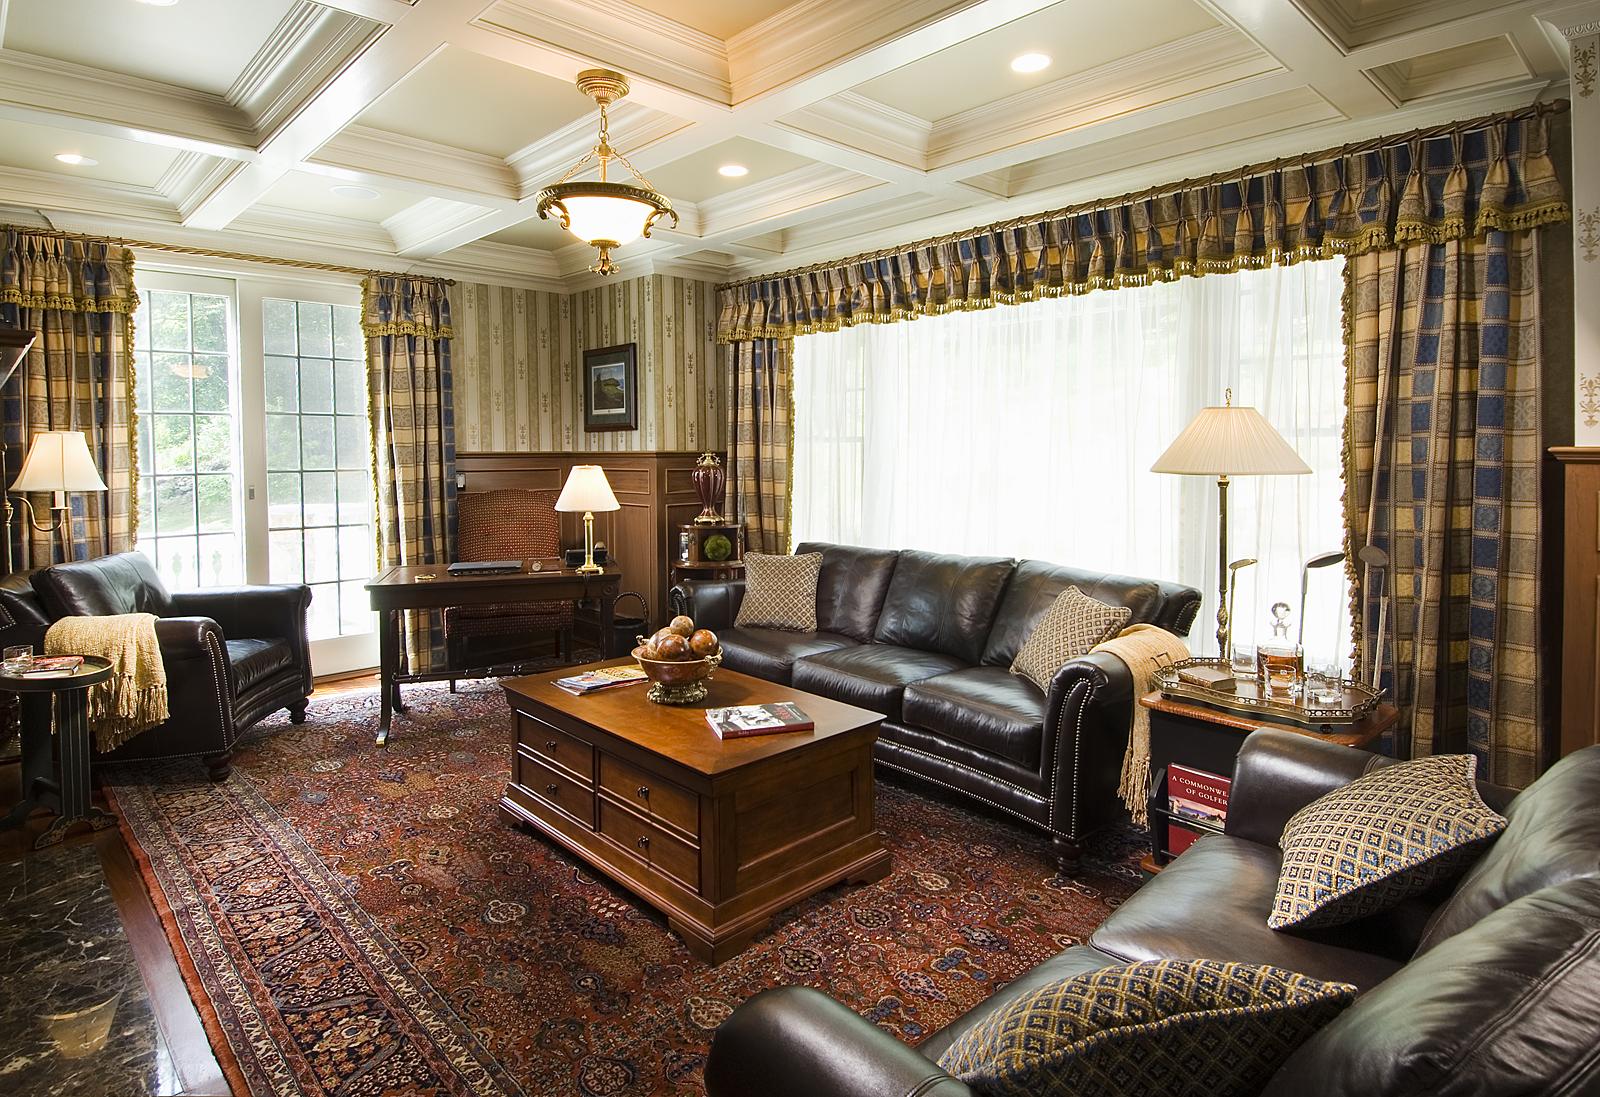 sara hopkins interiors interior designer in fairfield county